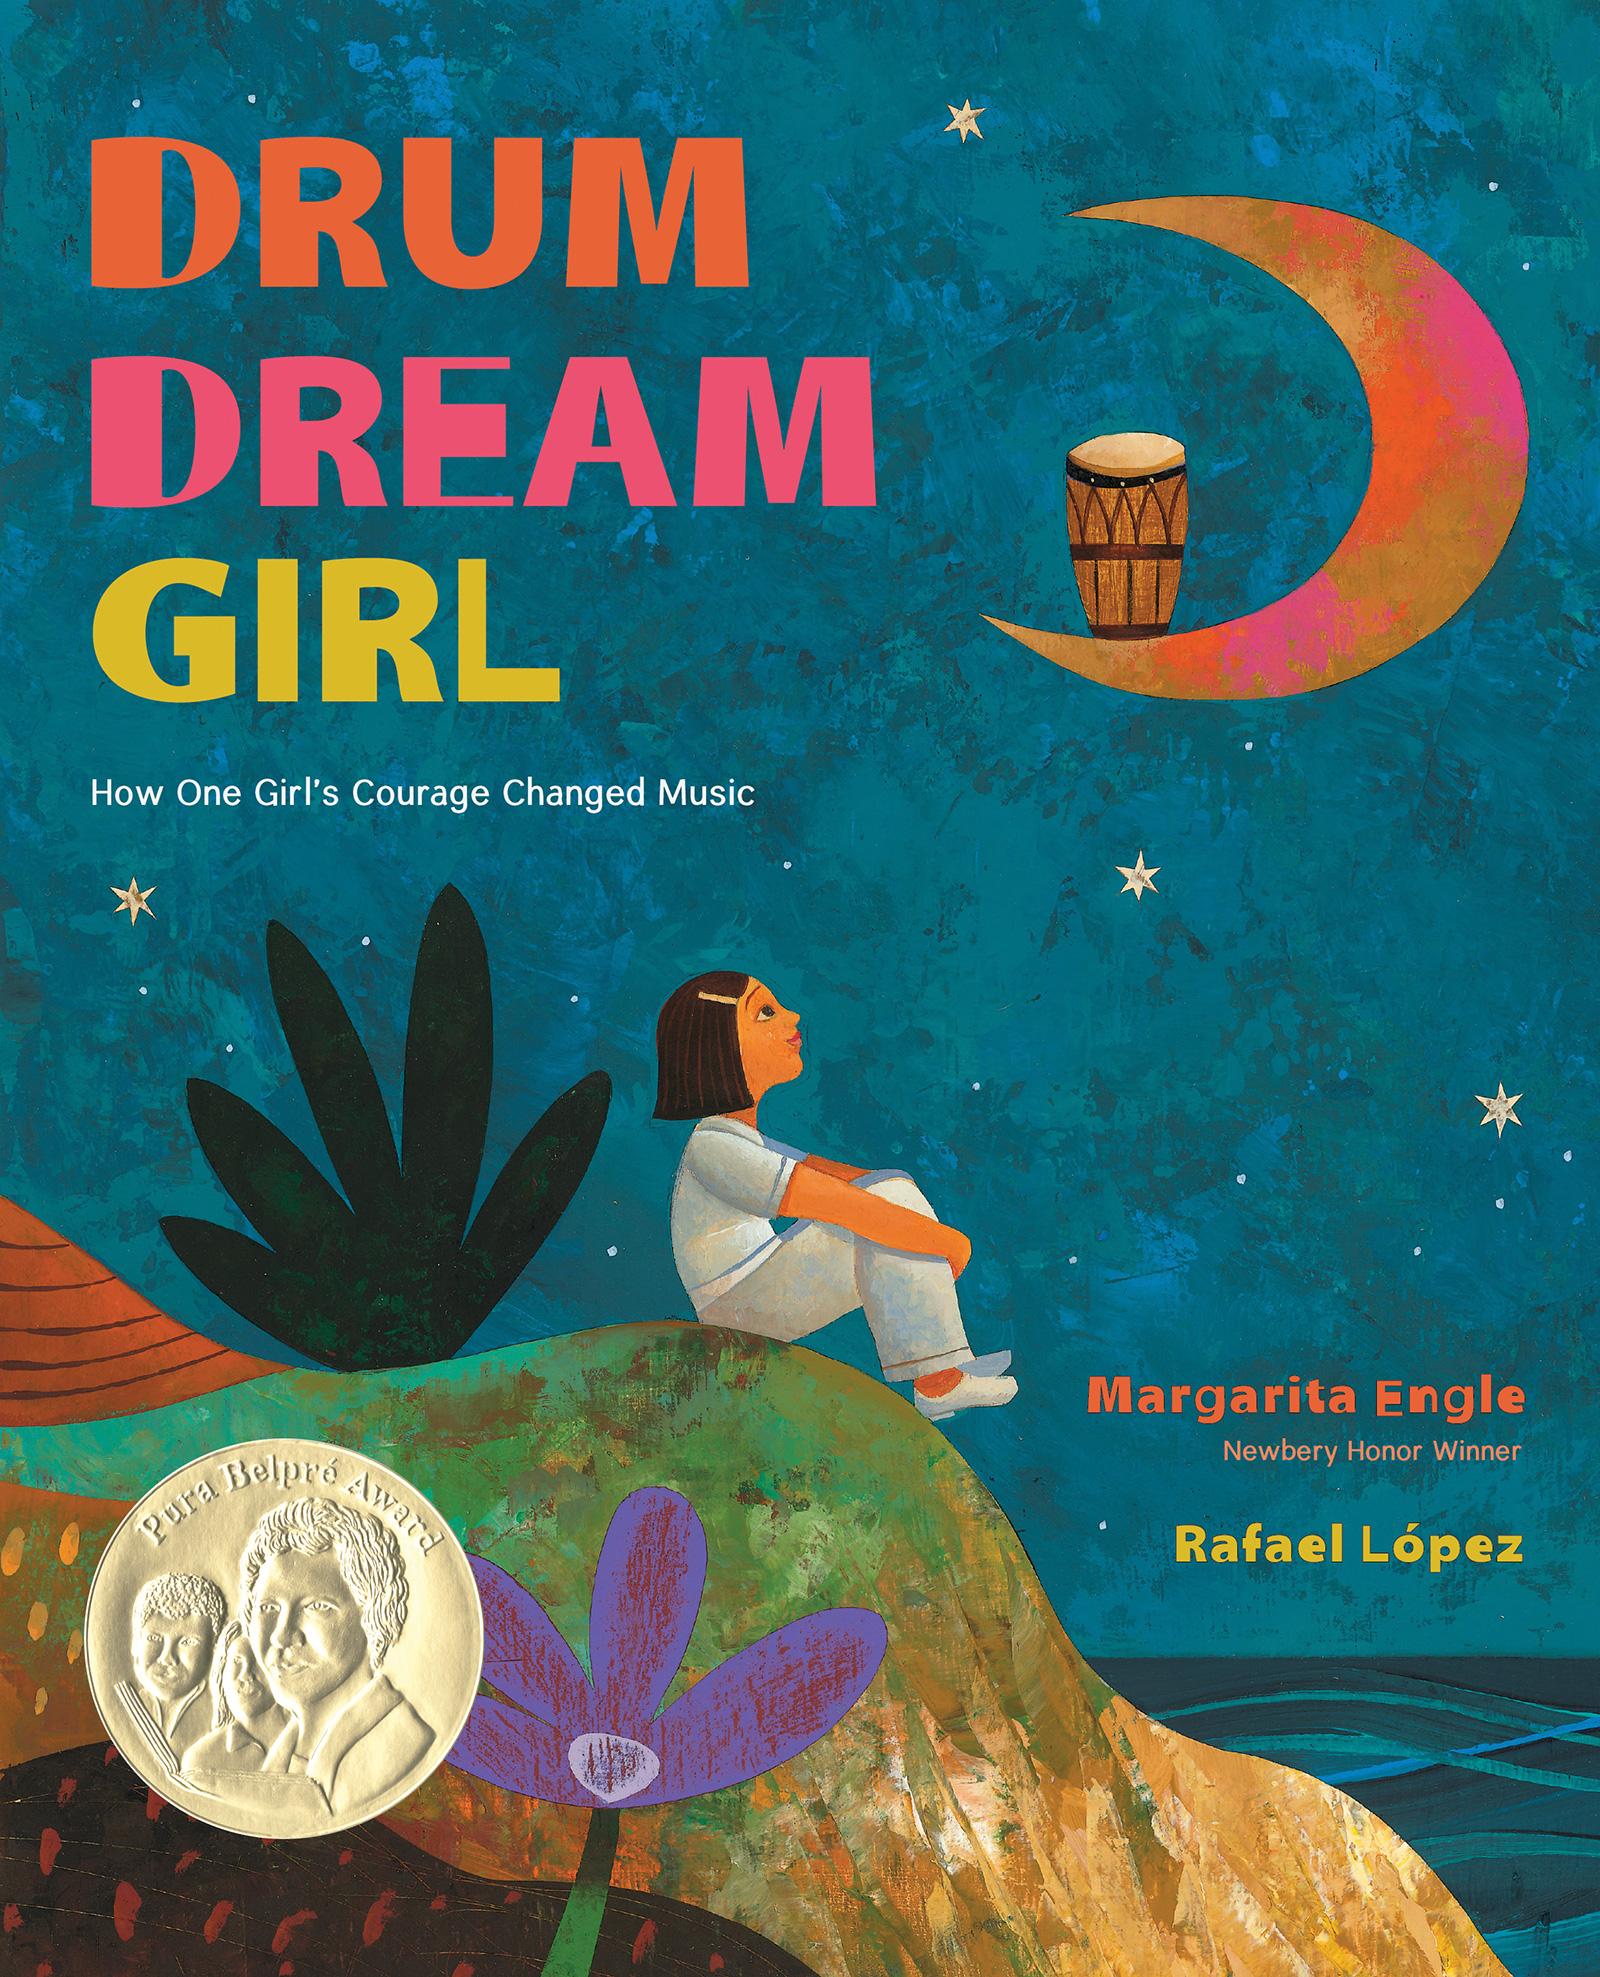 drum dream girl the hispanic outlooK-12 magazine